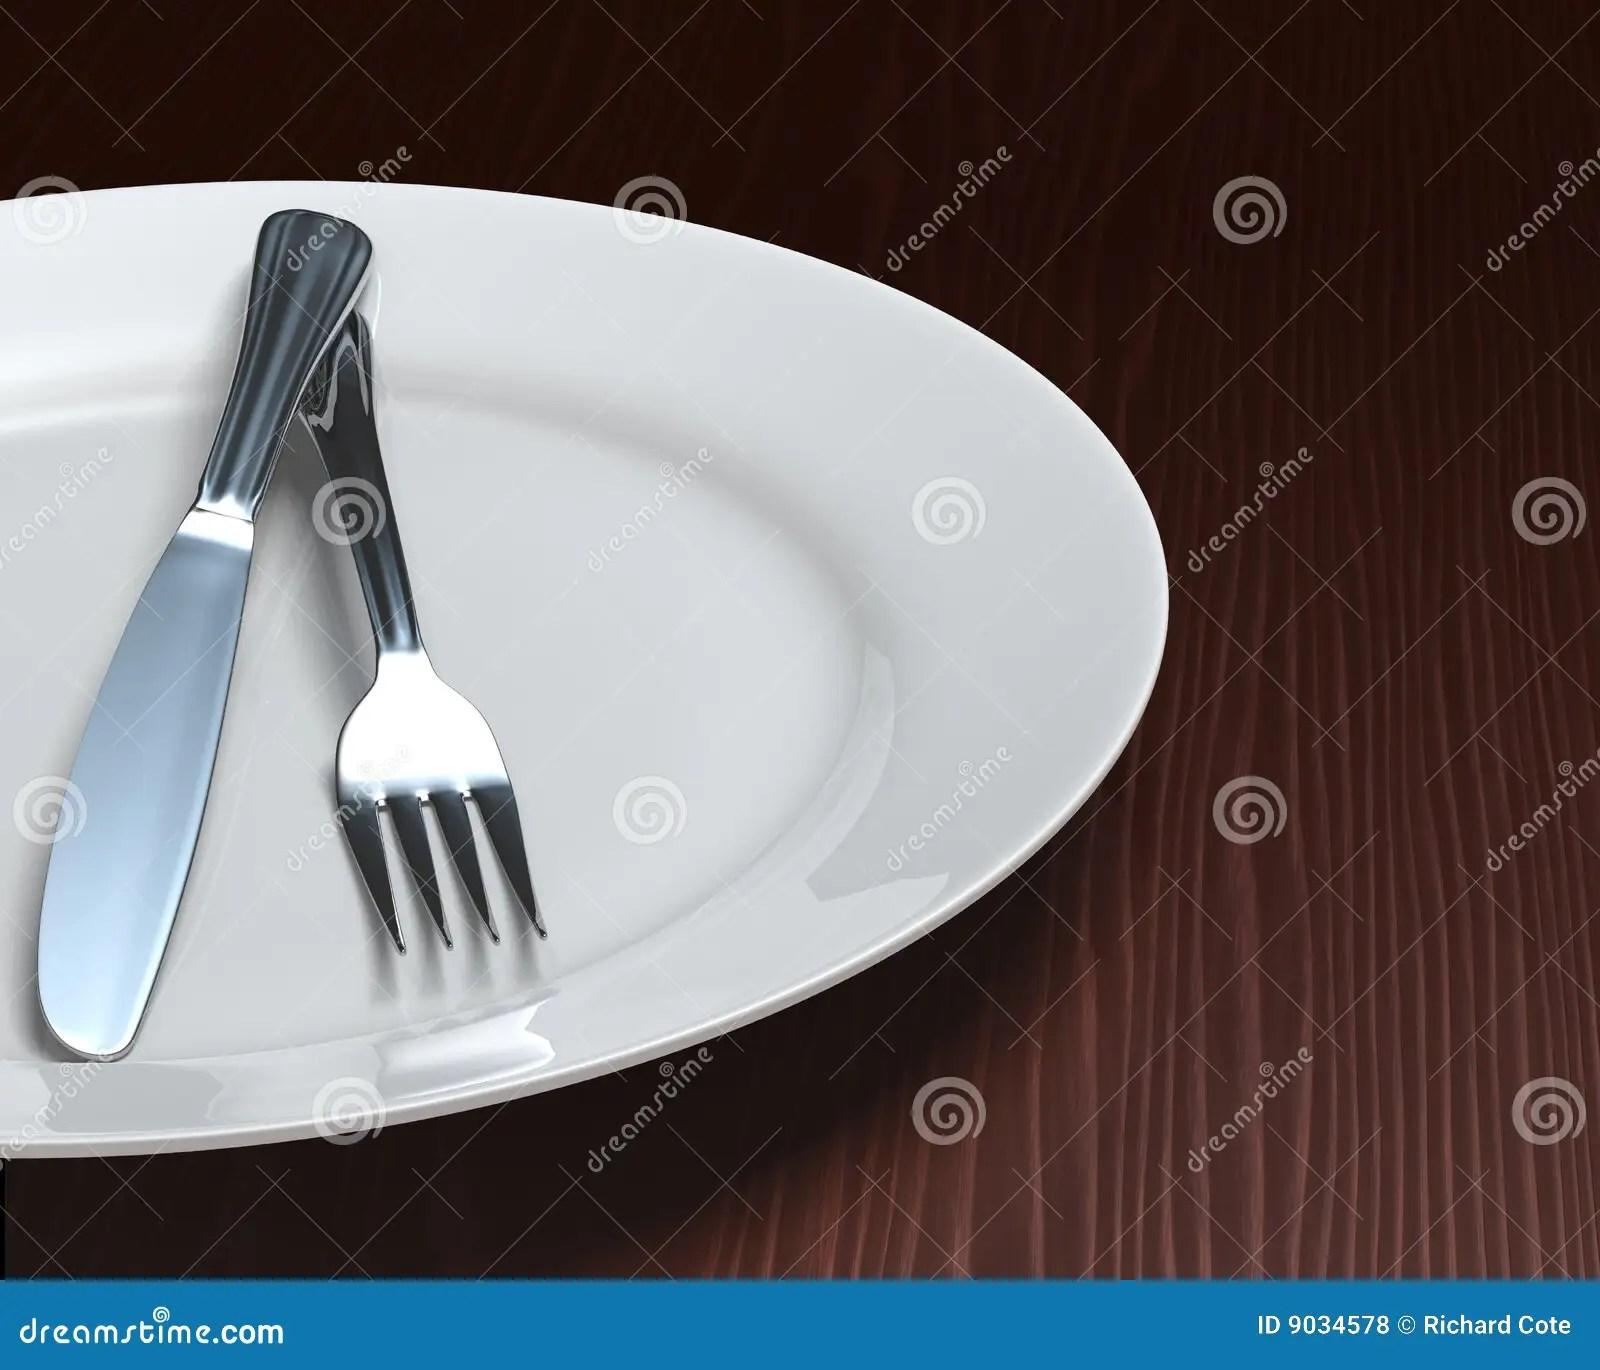 Clean Plate  Cutlery On Dark Woodgrain Table Royalty Free